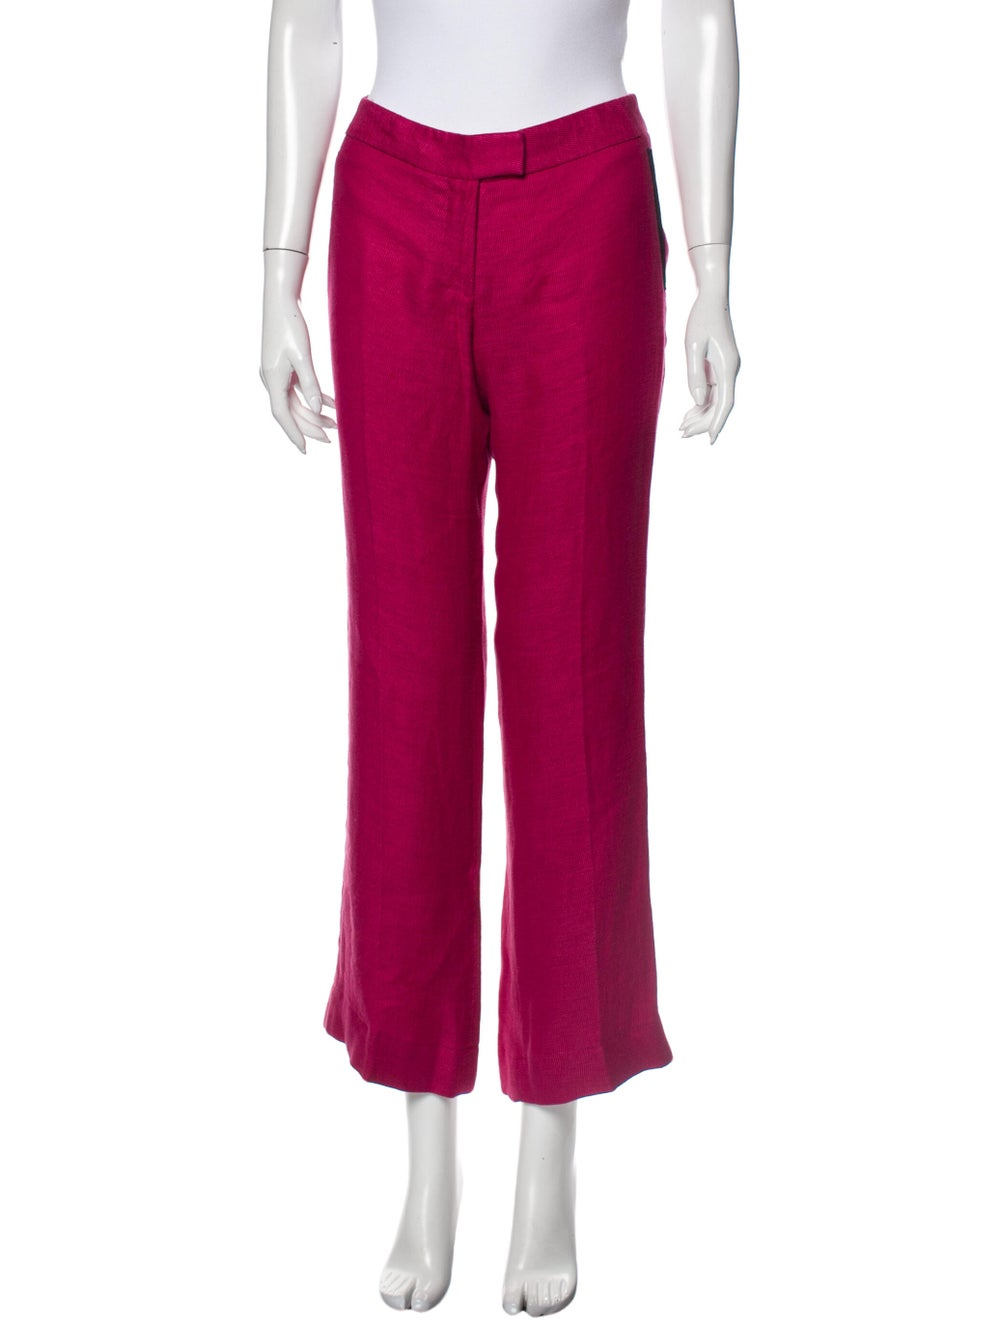 Veronica Beard Linen Wide Leg Pants Pink - image 1